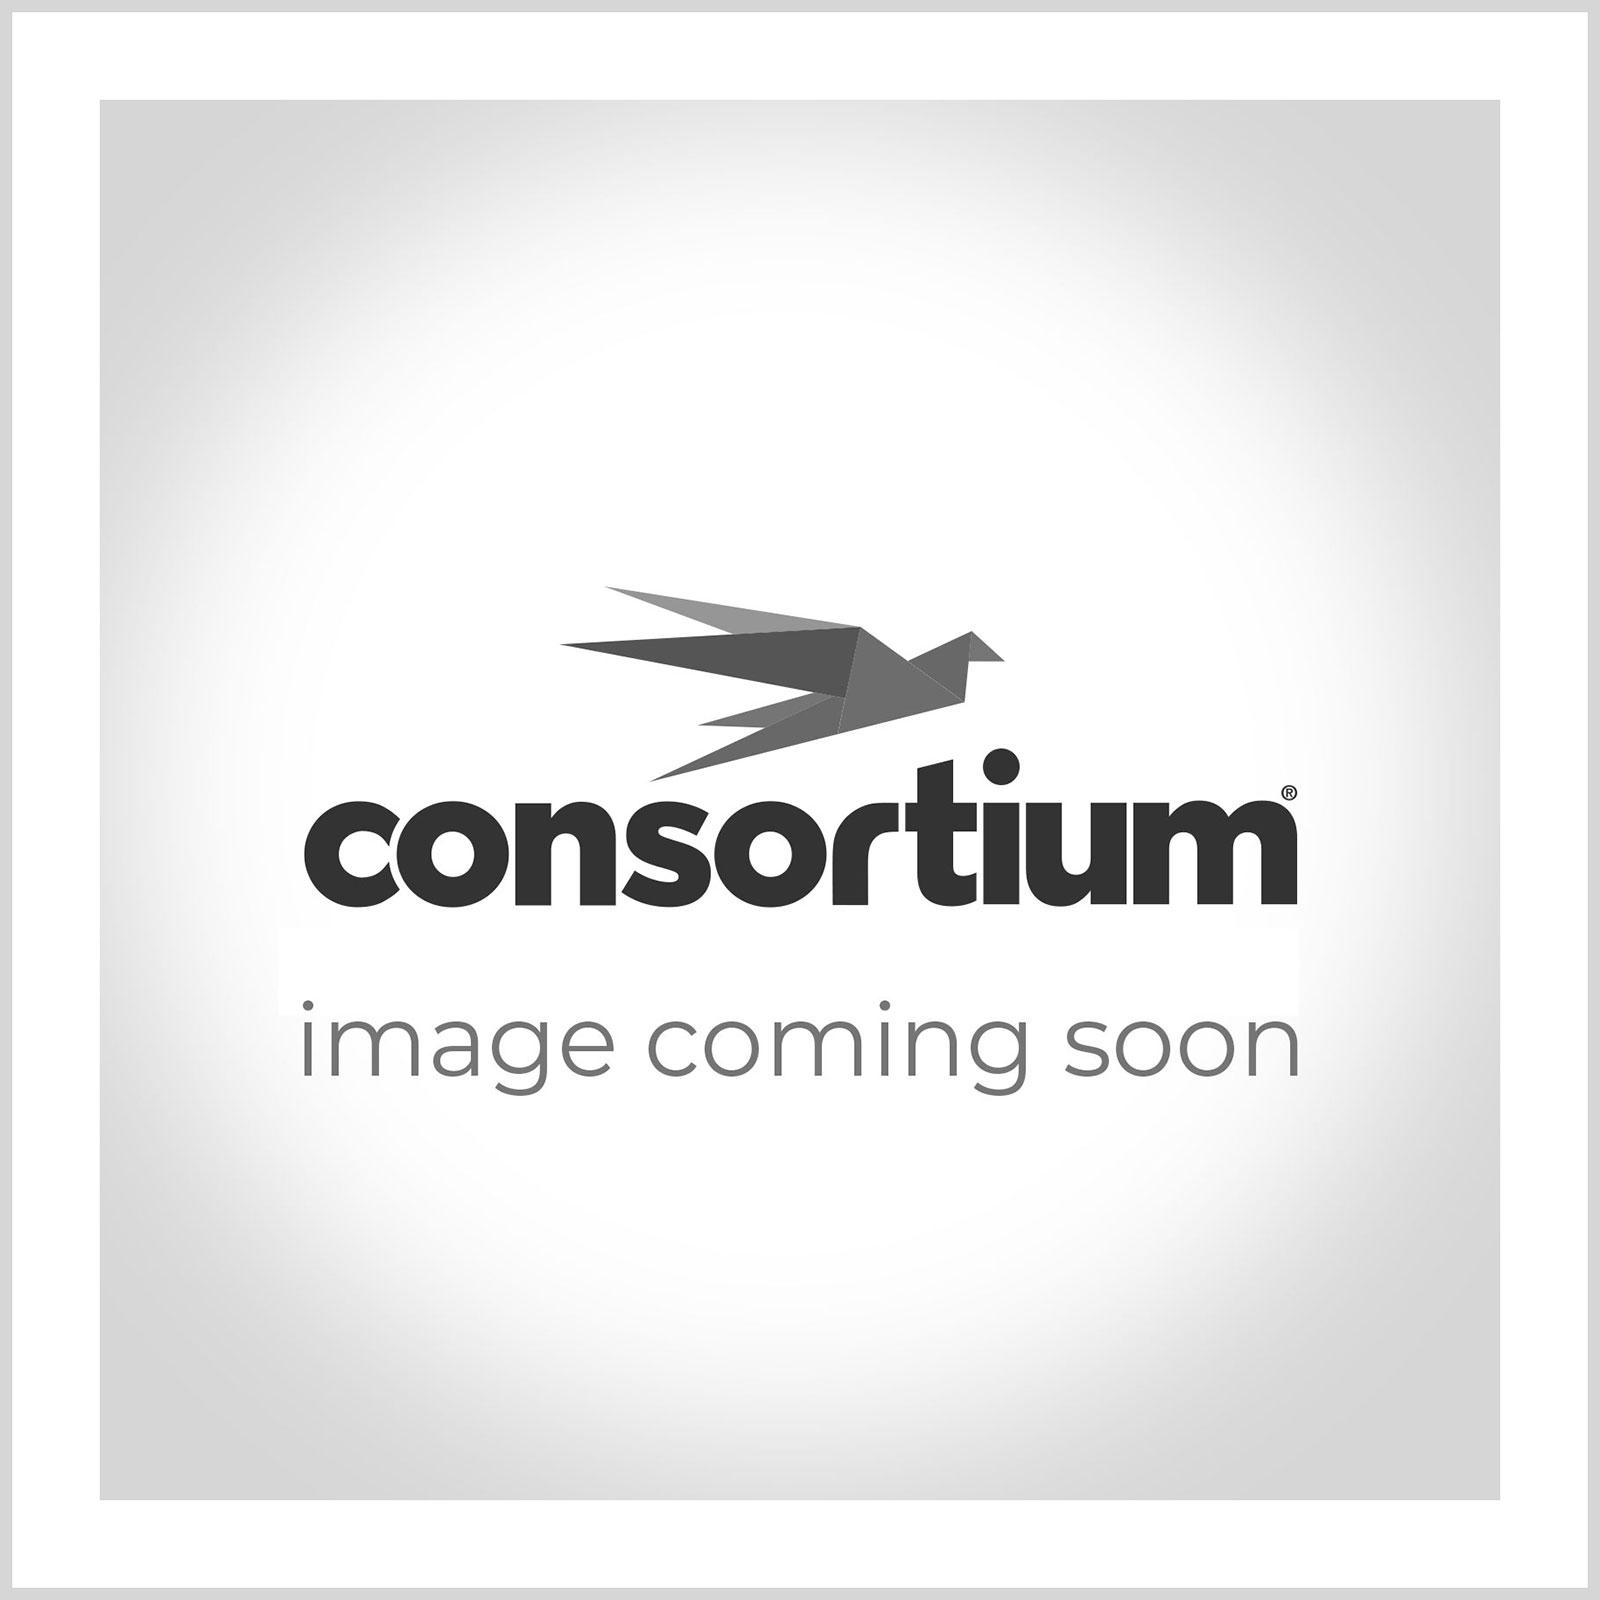 Consortium Jumbo Toilet Rolls 2 Ply